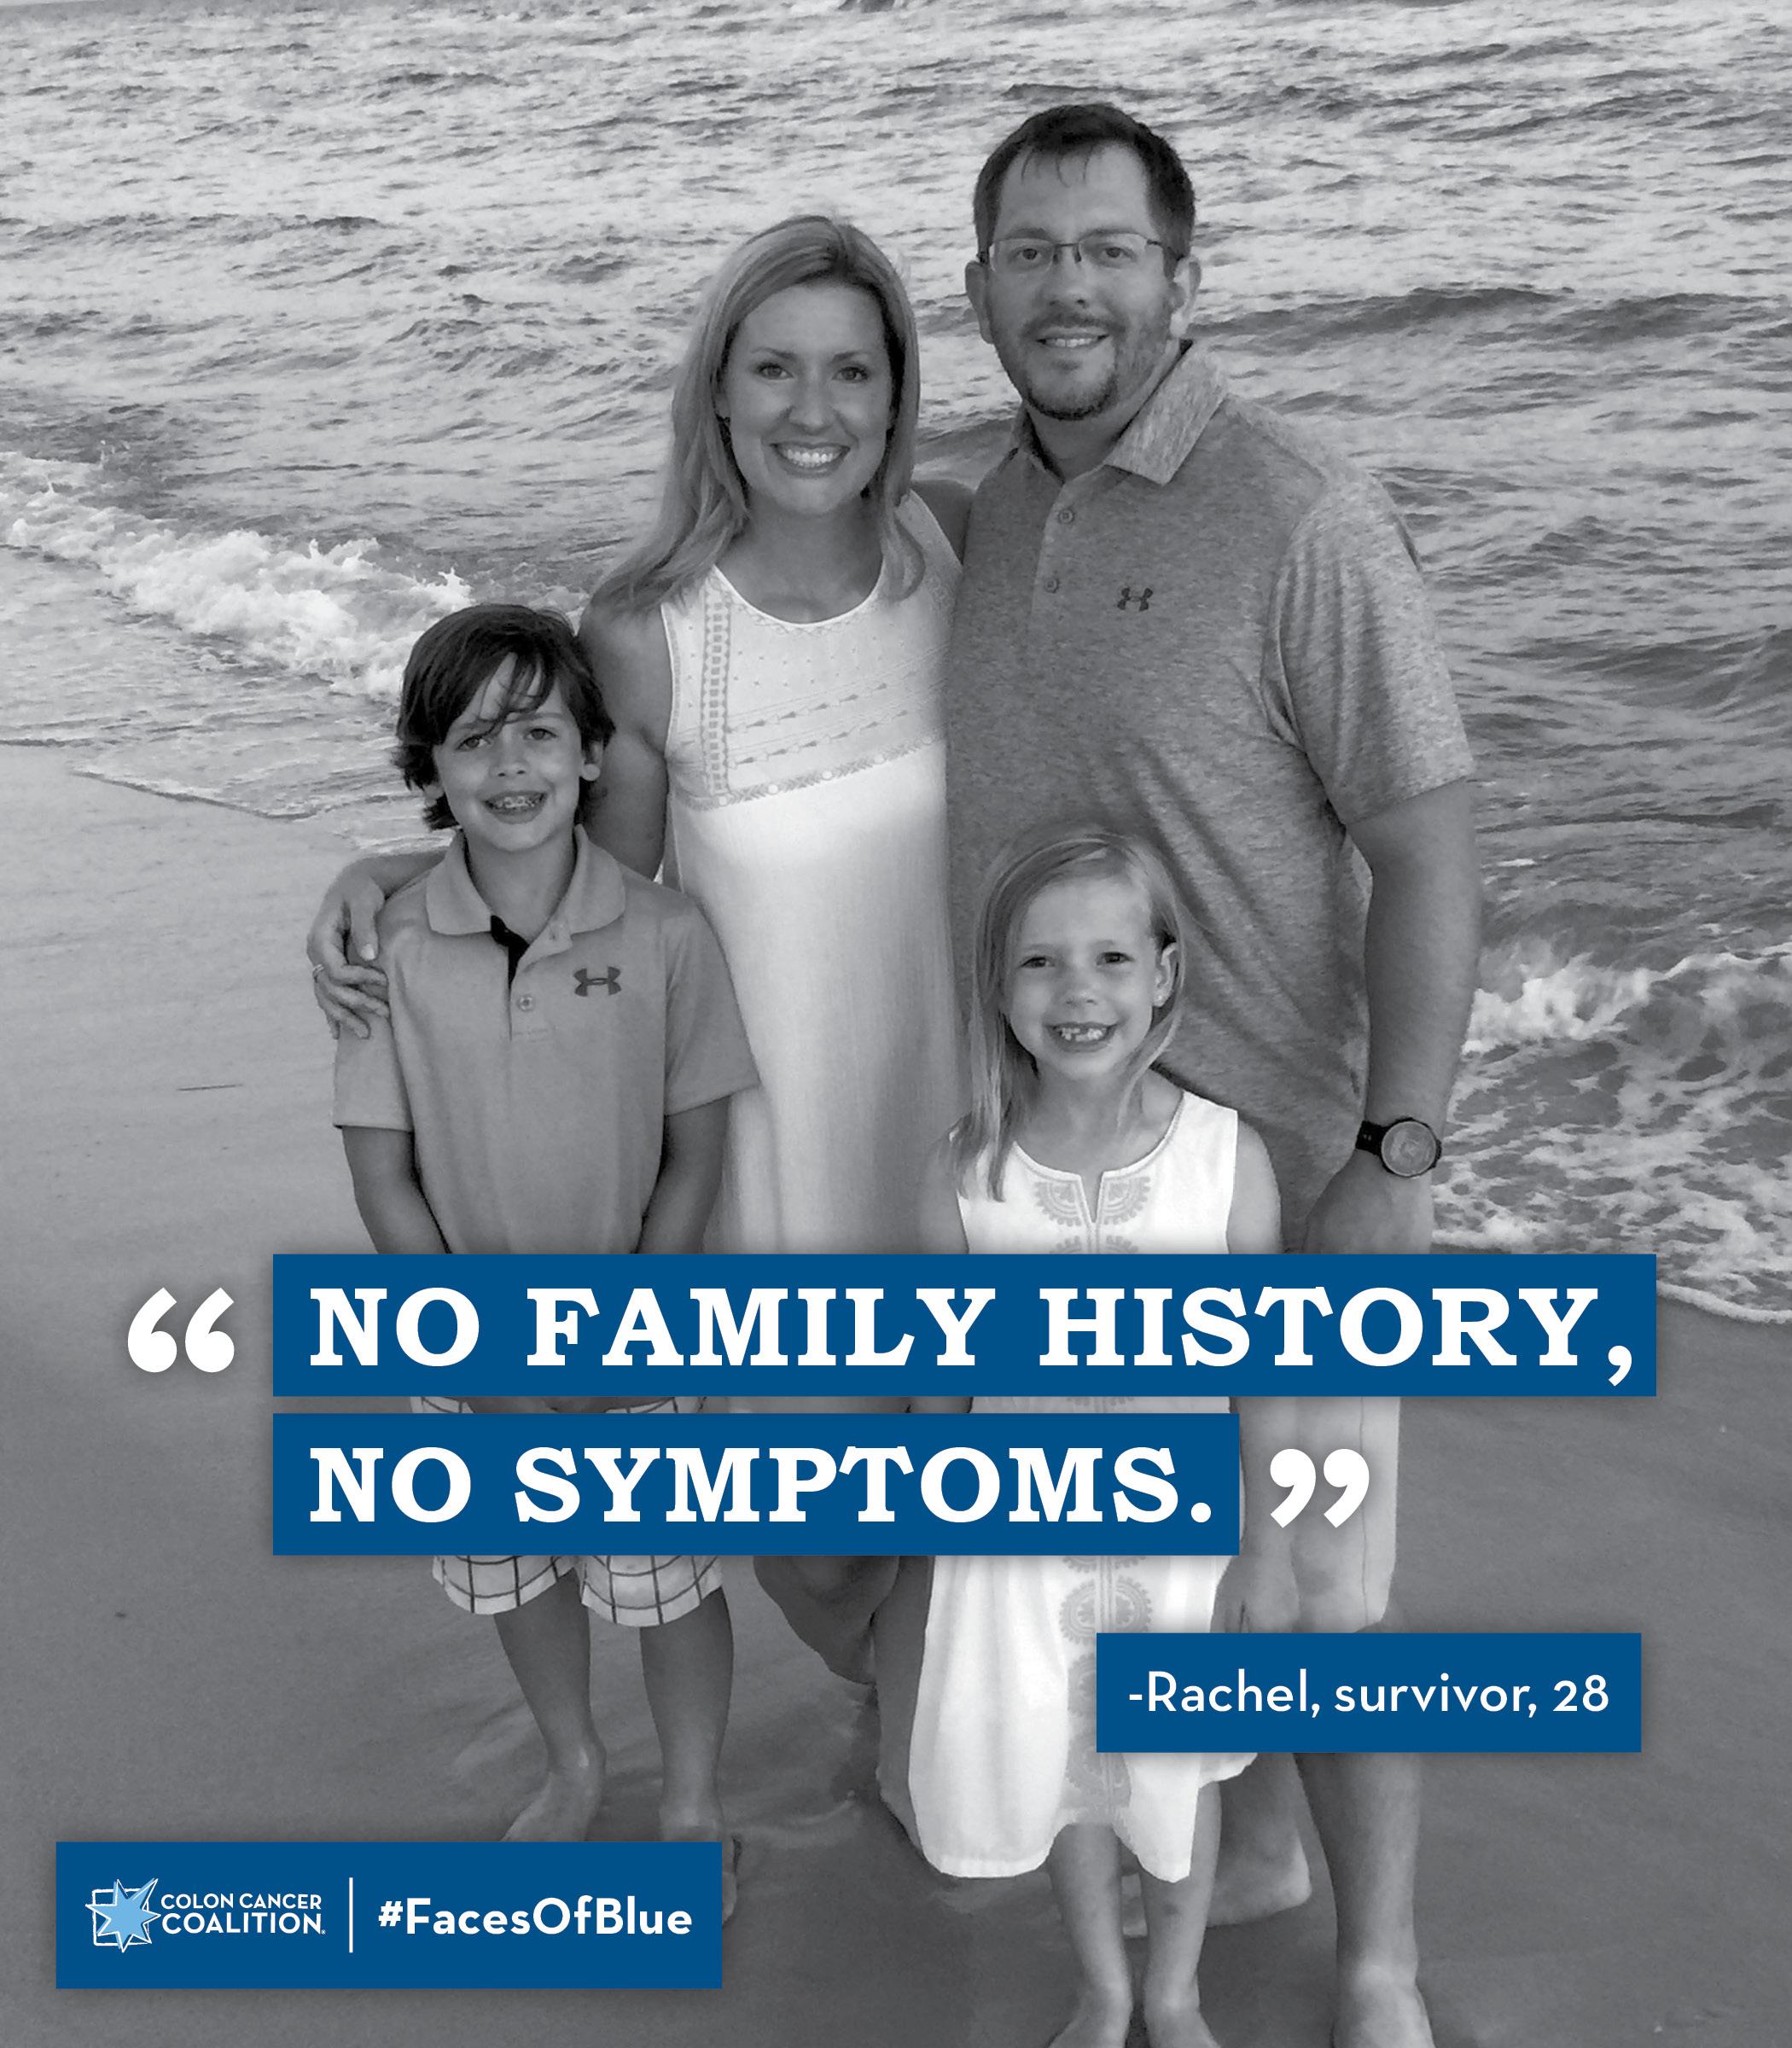 2017 Faces Of Blue Colon Cancer Coalition